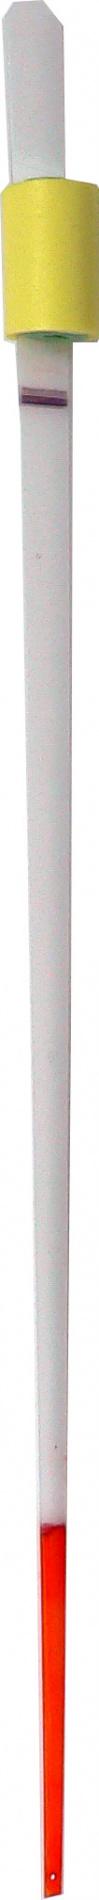 Сторожок лавсановый DIXXON-Rus Спорт 150х0,27мм Сторожки<br><br>